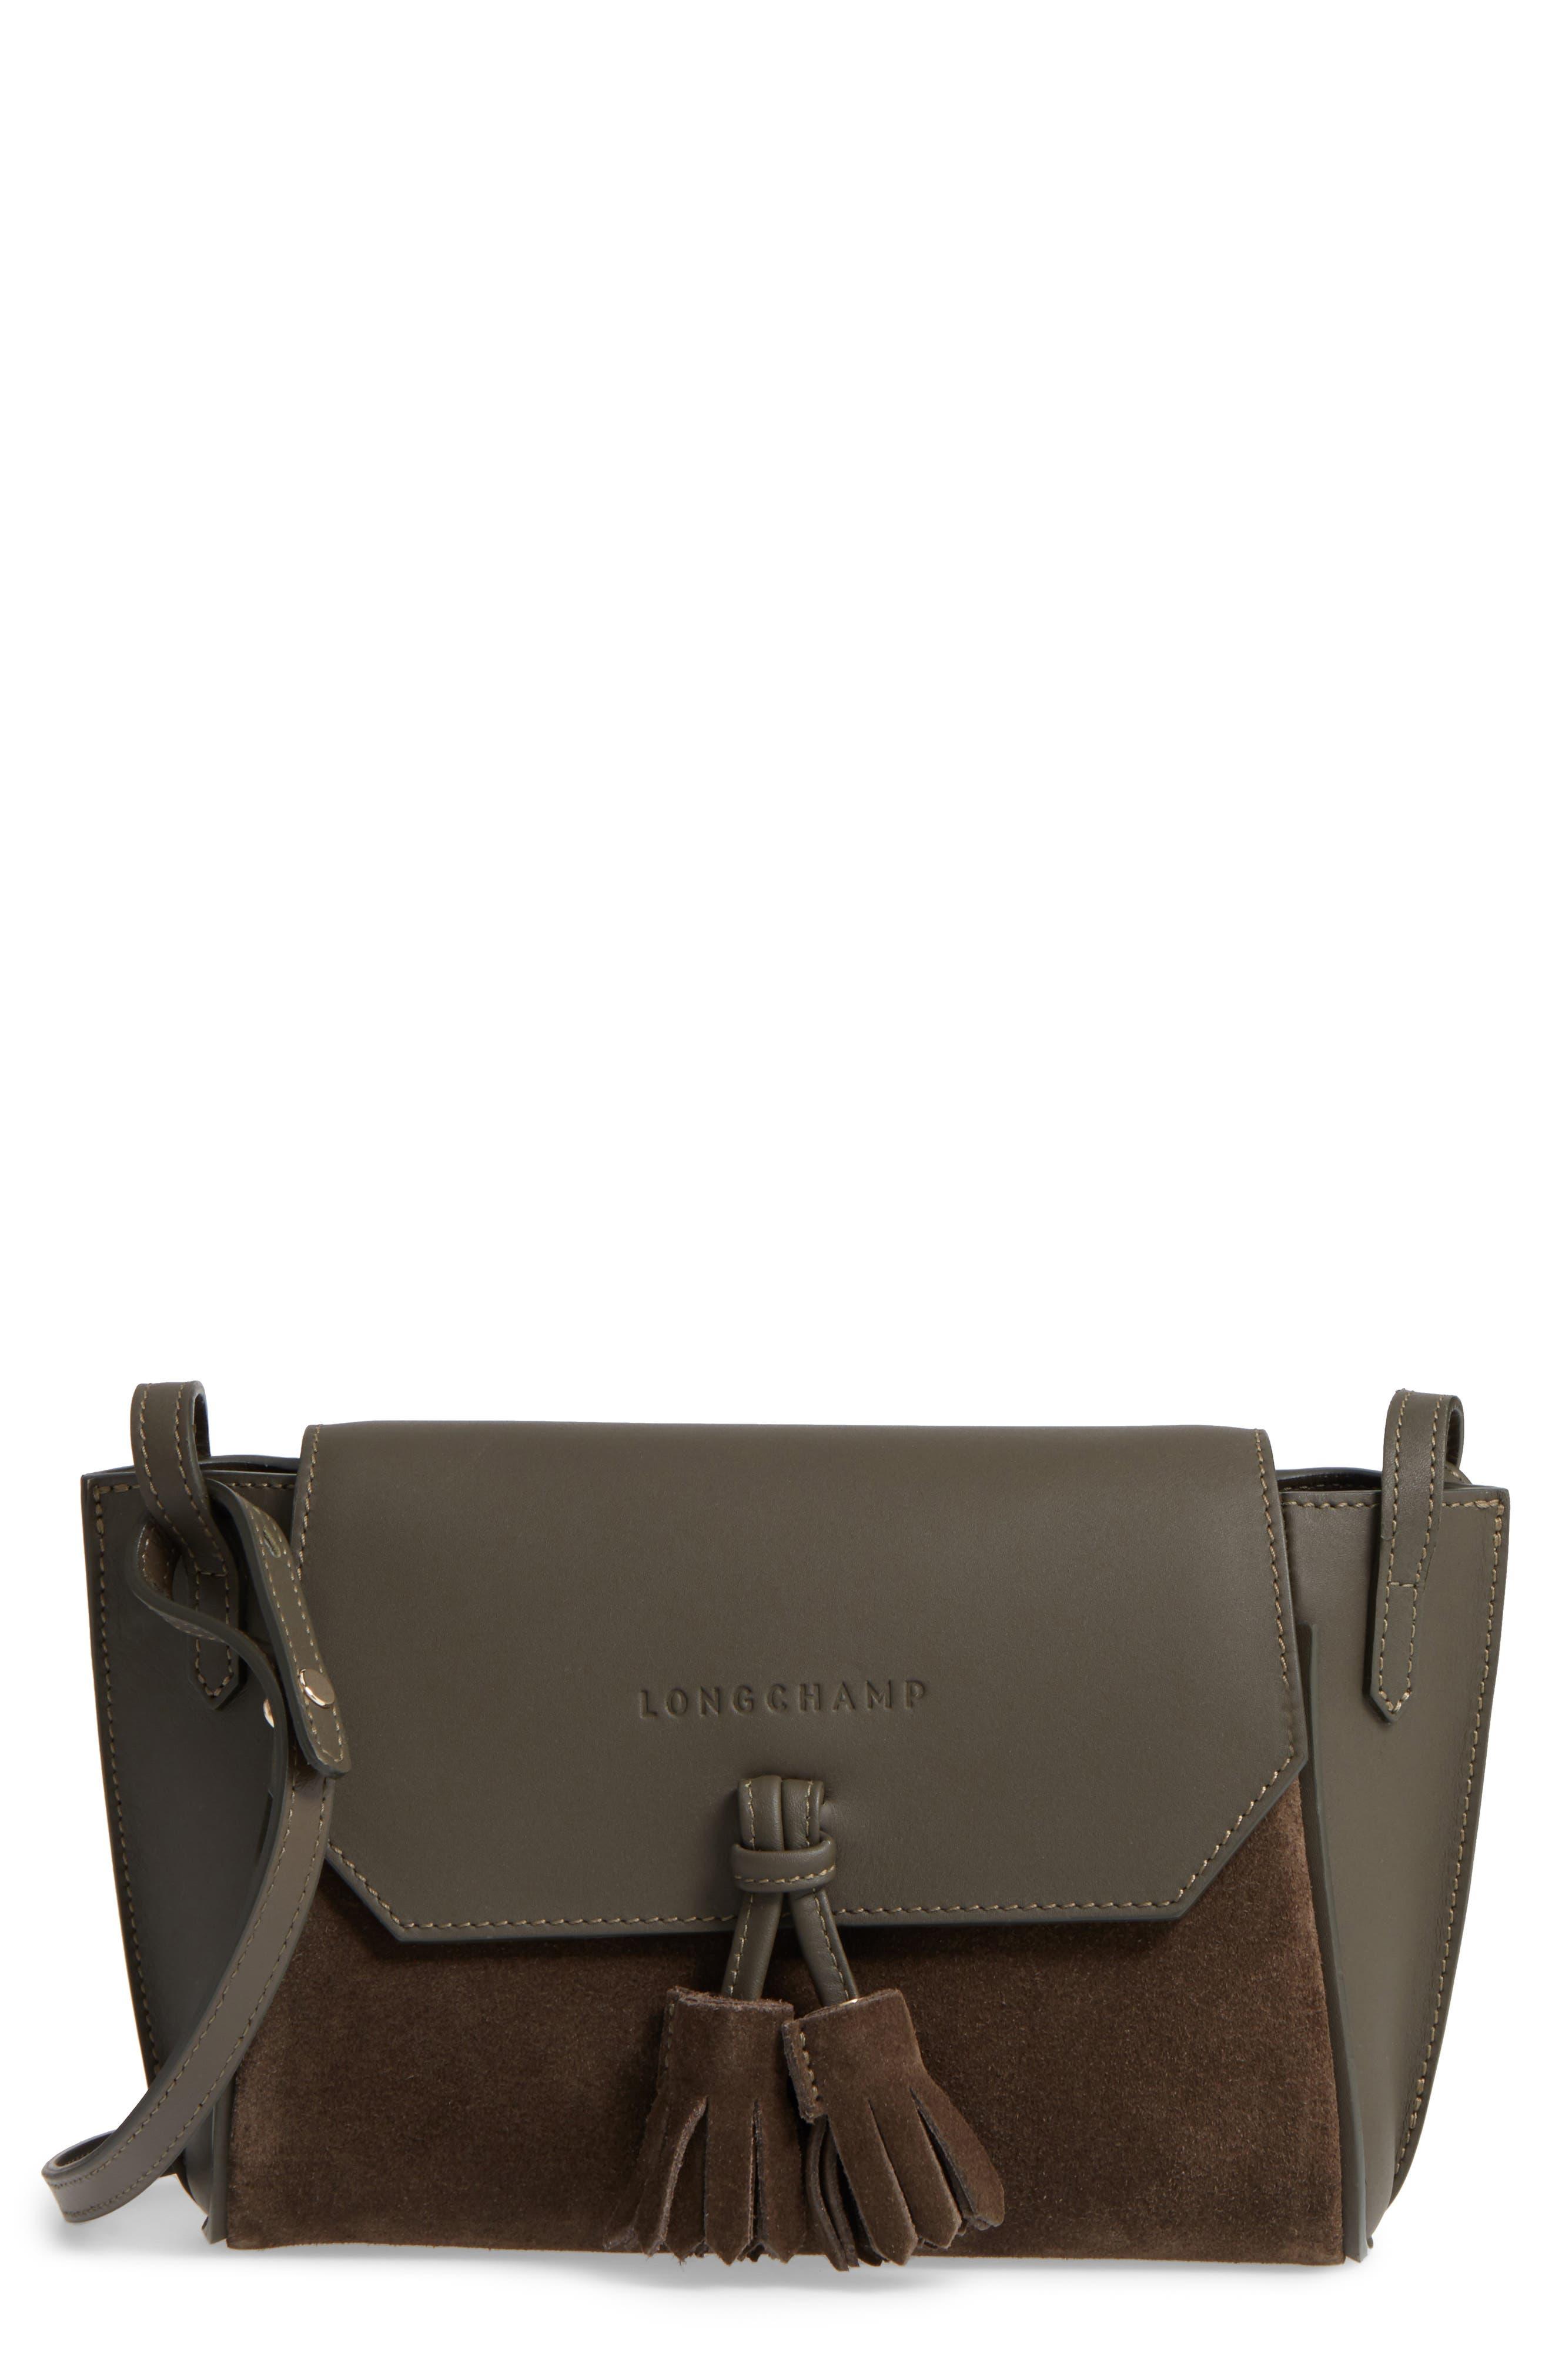 Alternate Image 1 Selected - Longchamp Small Penelope Leather Crossbody Bag